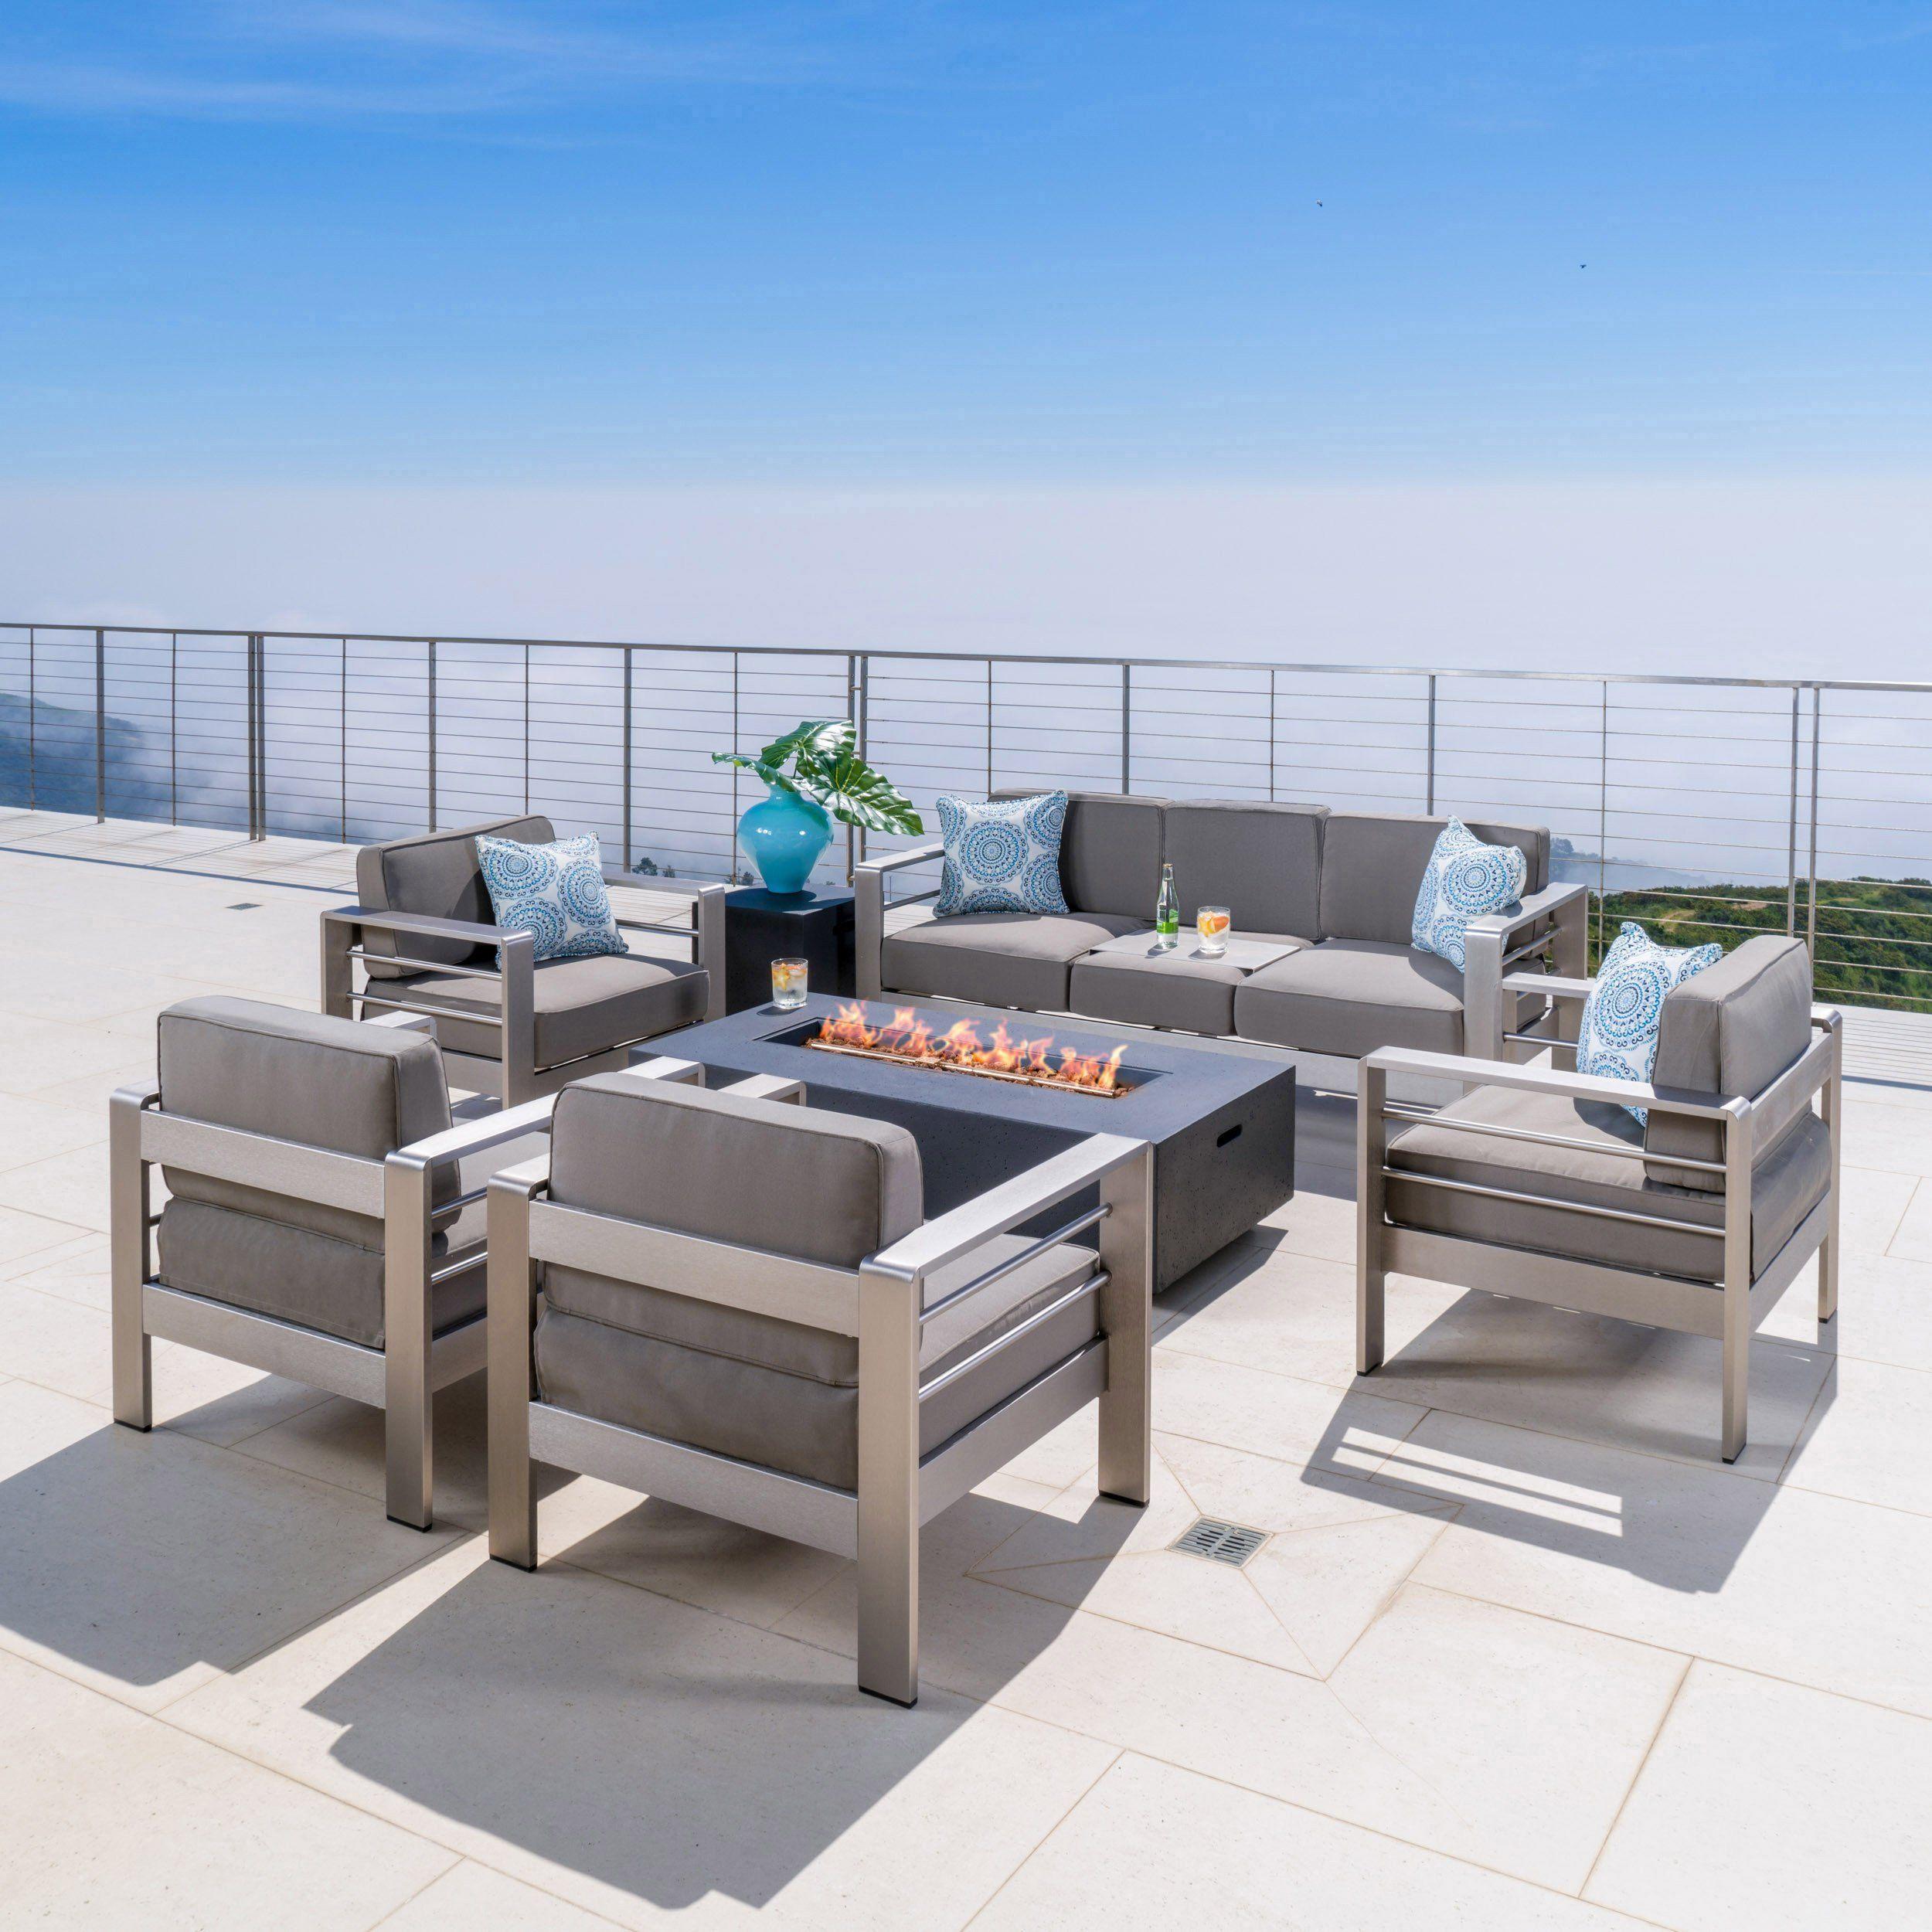 coral bay outdoor 4 pc club chair set w 3 seat loveseat firepit rh pinterest com